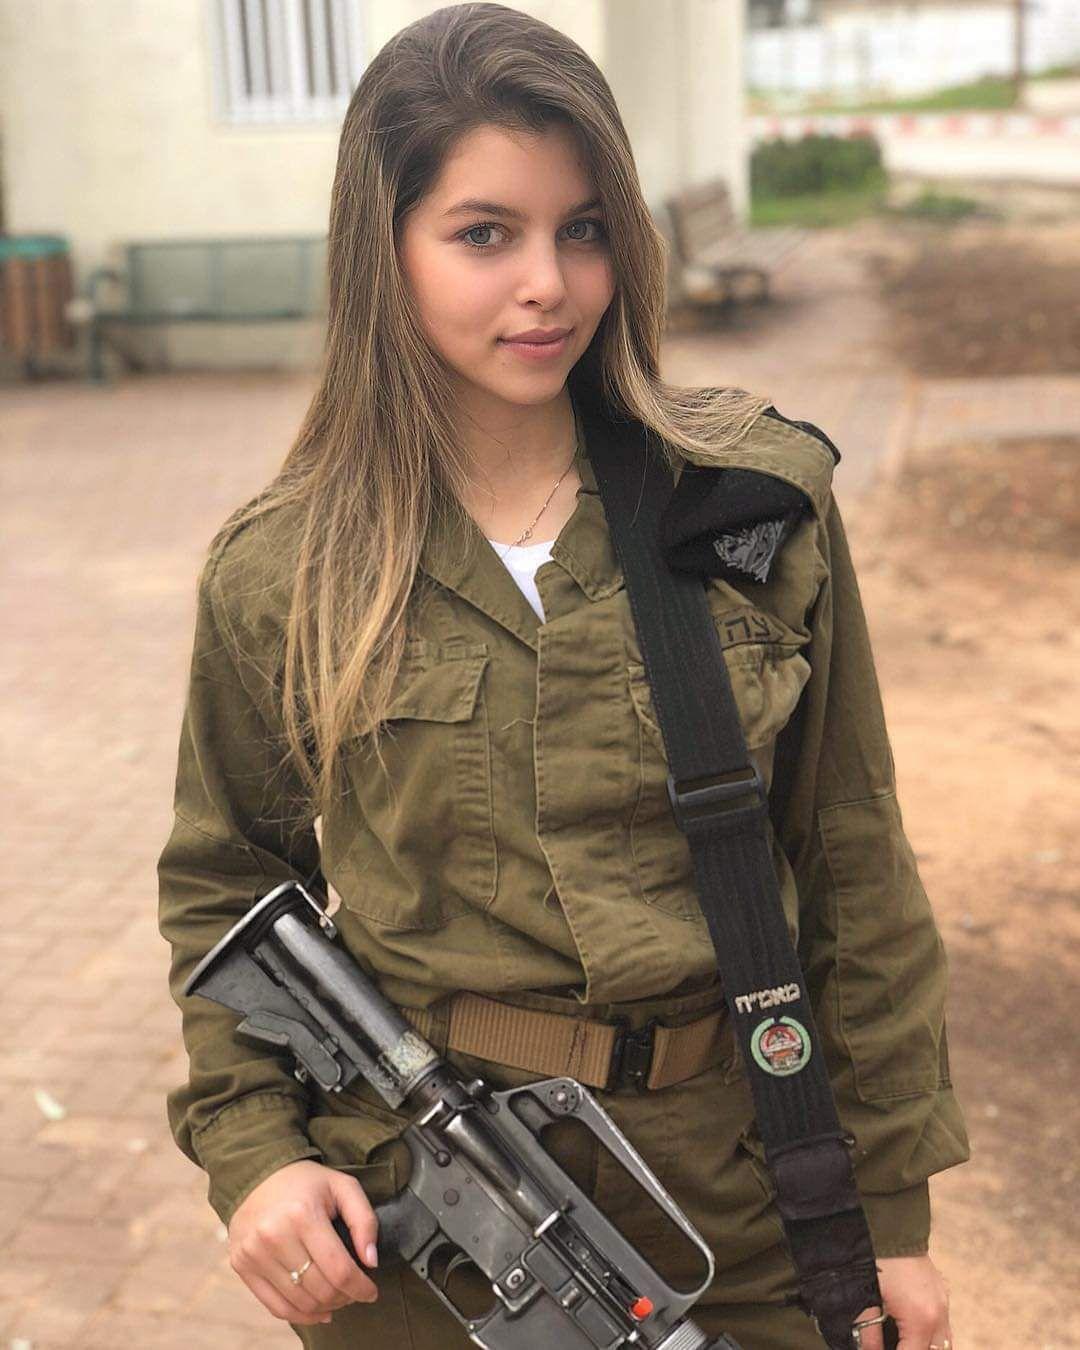 IDF - Israel Defense Forces - Women | Military women